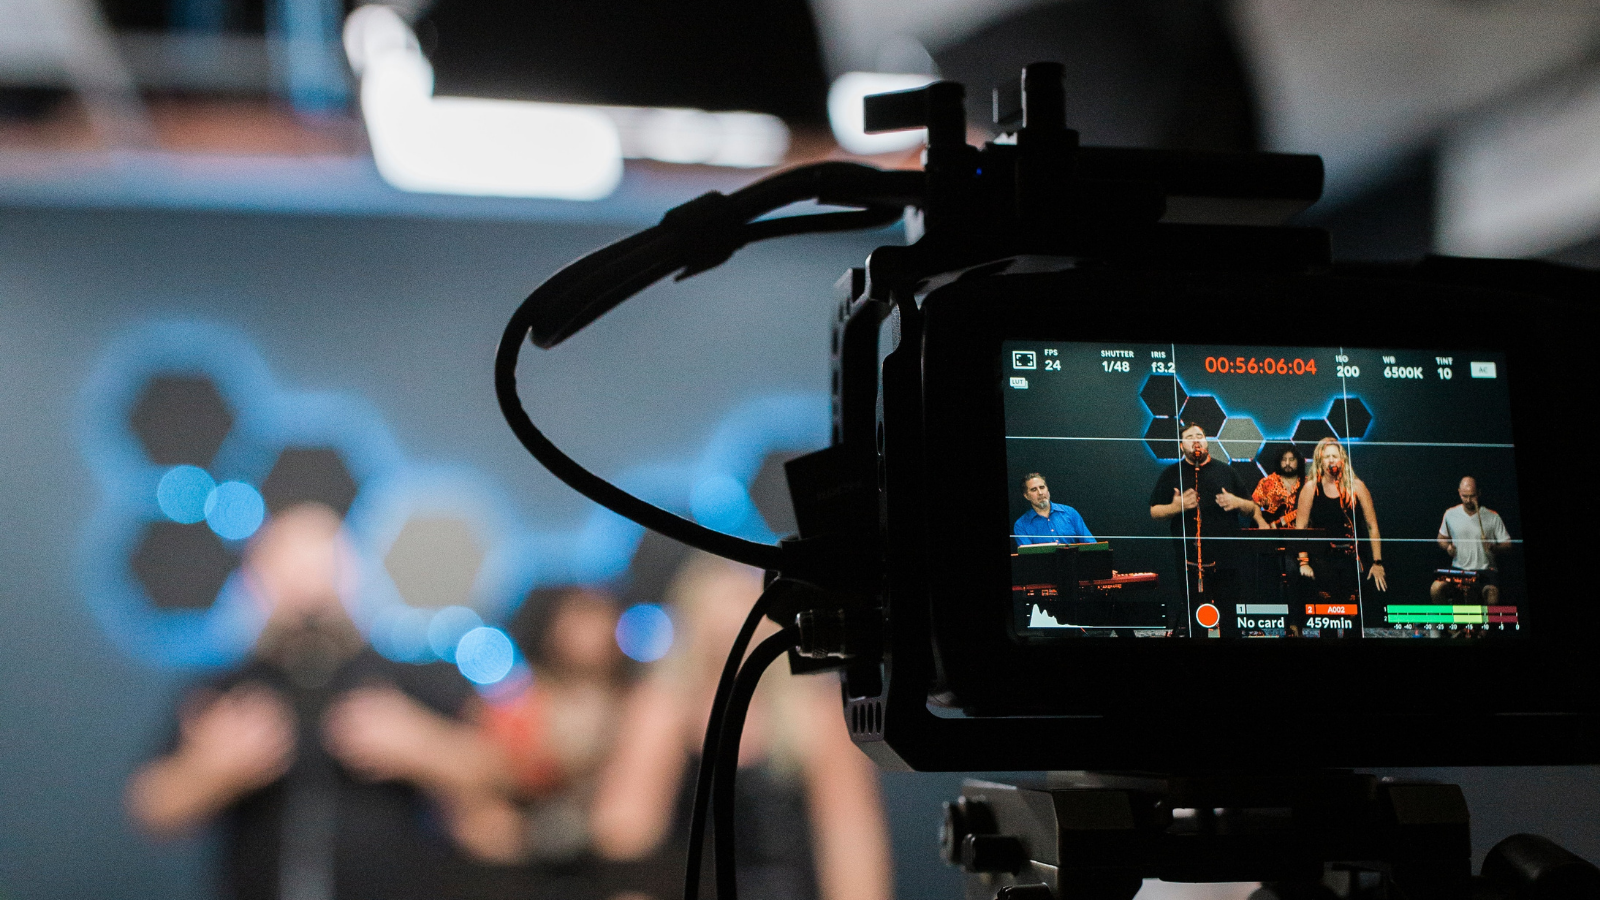 Why You Should Consider Marketing Your Brand Through A Livestream